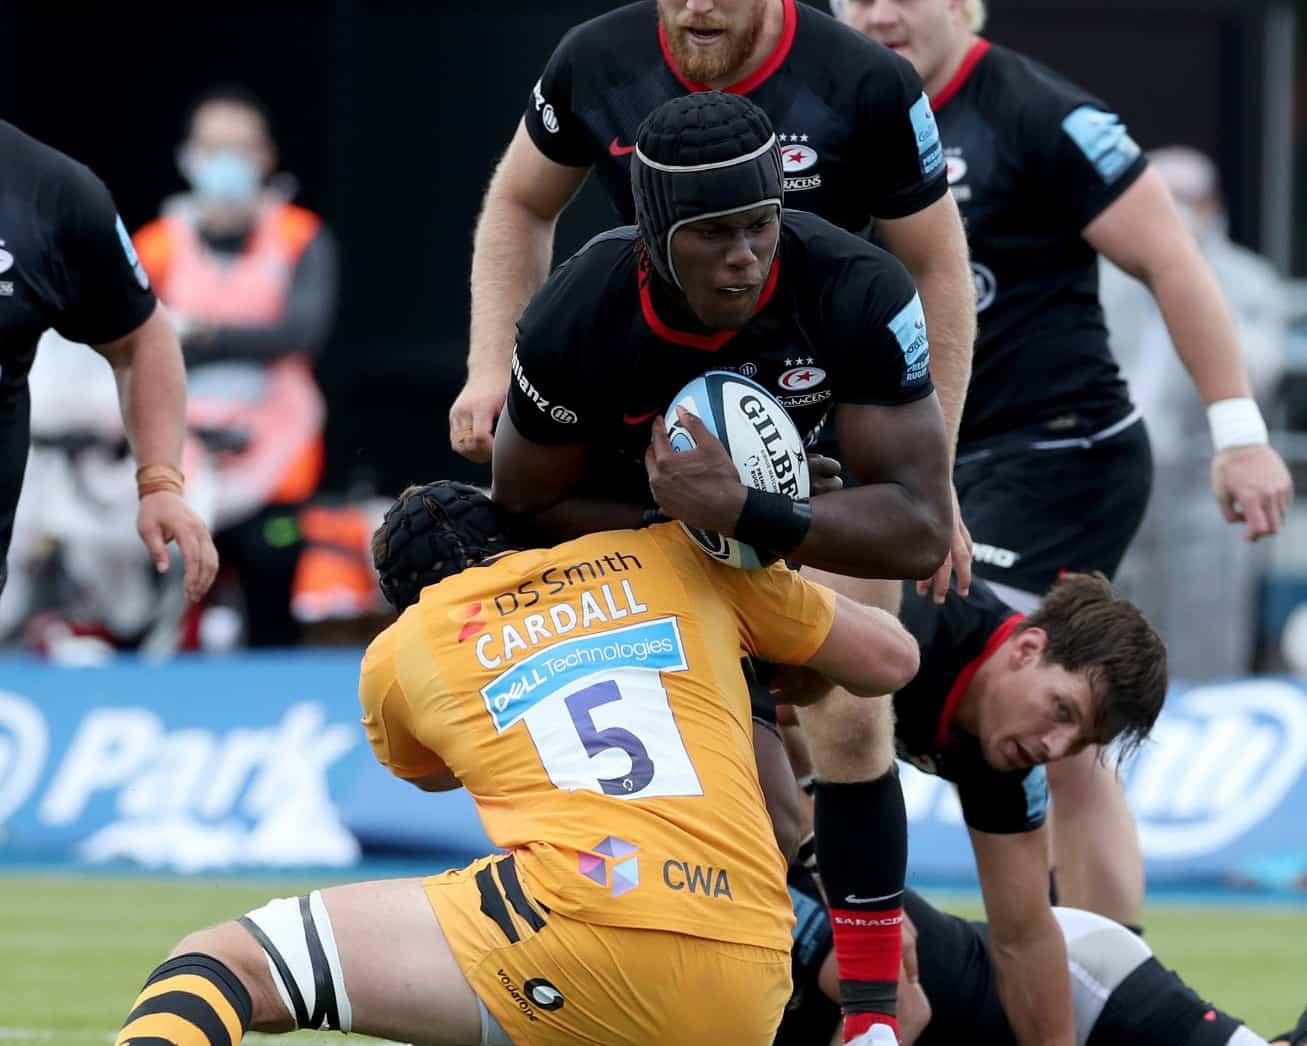 Match Report: Saracens Men 18-28 Wasps - Saracens